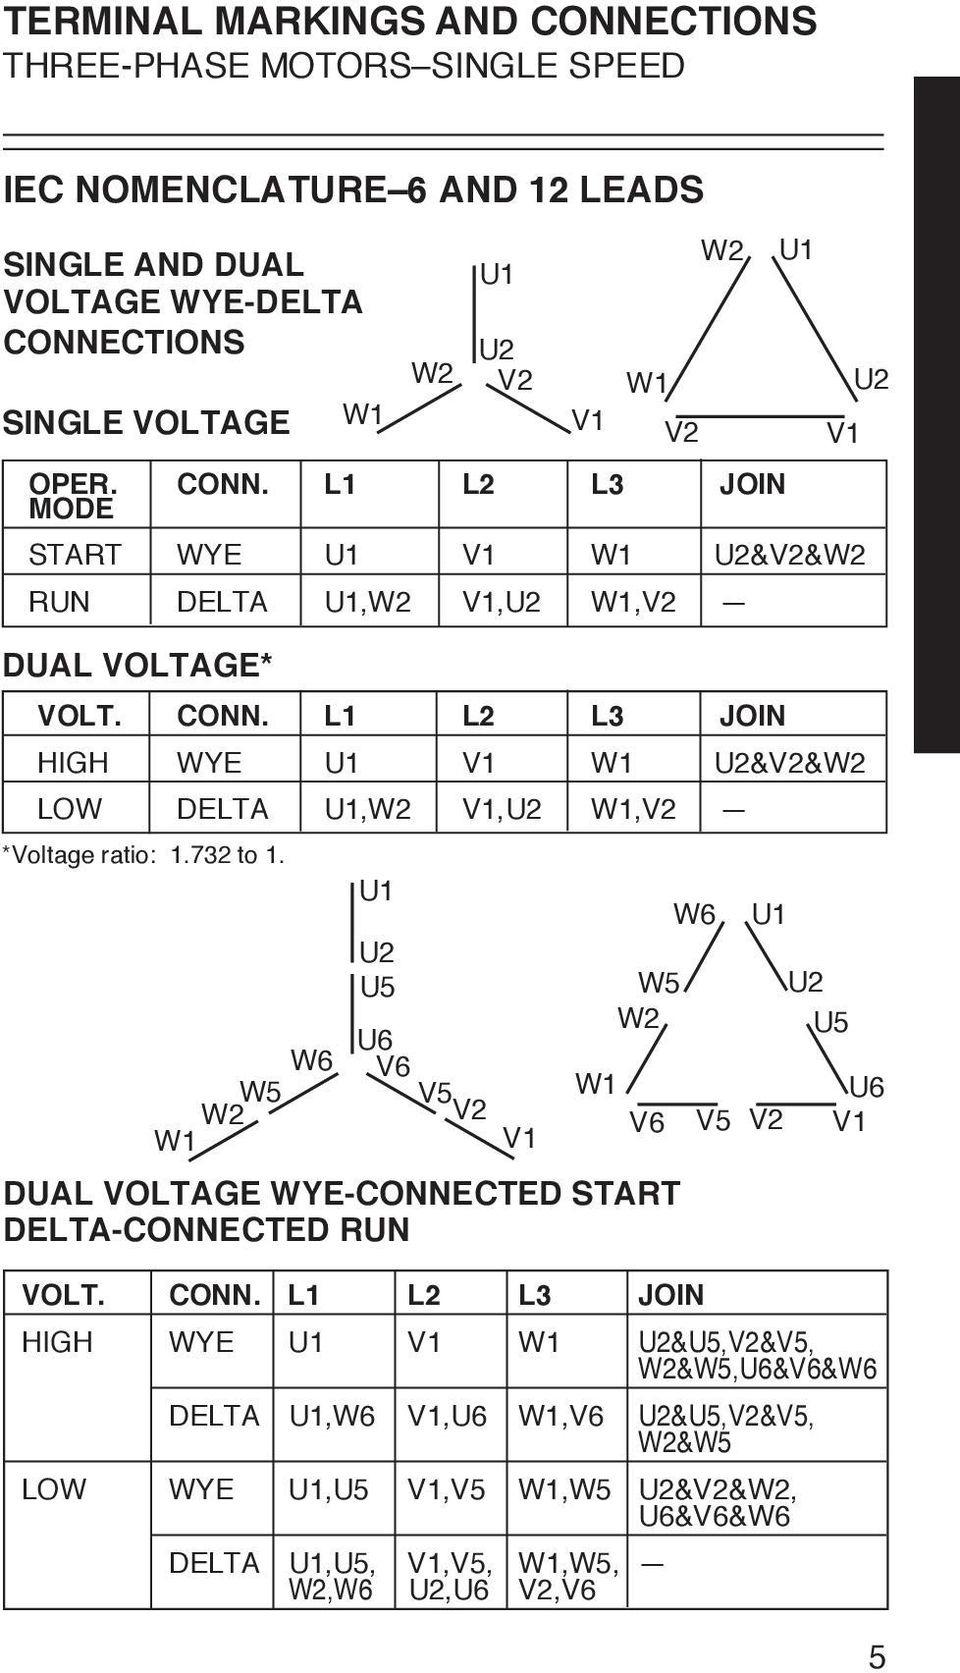 hight resolution of 3 phase motor wiring diagram 12 leads wirings diagram 480 volt motor wiring 12 lead motor